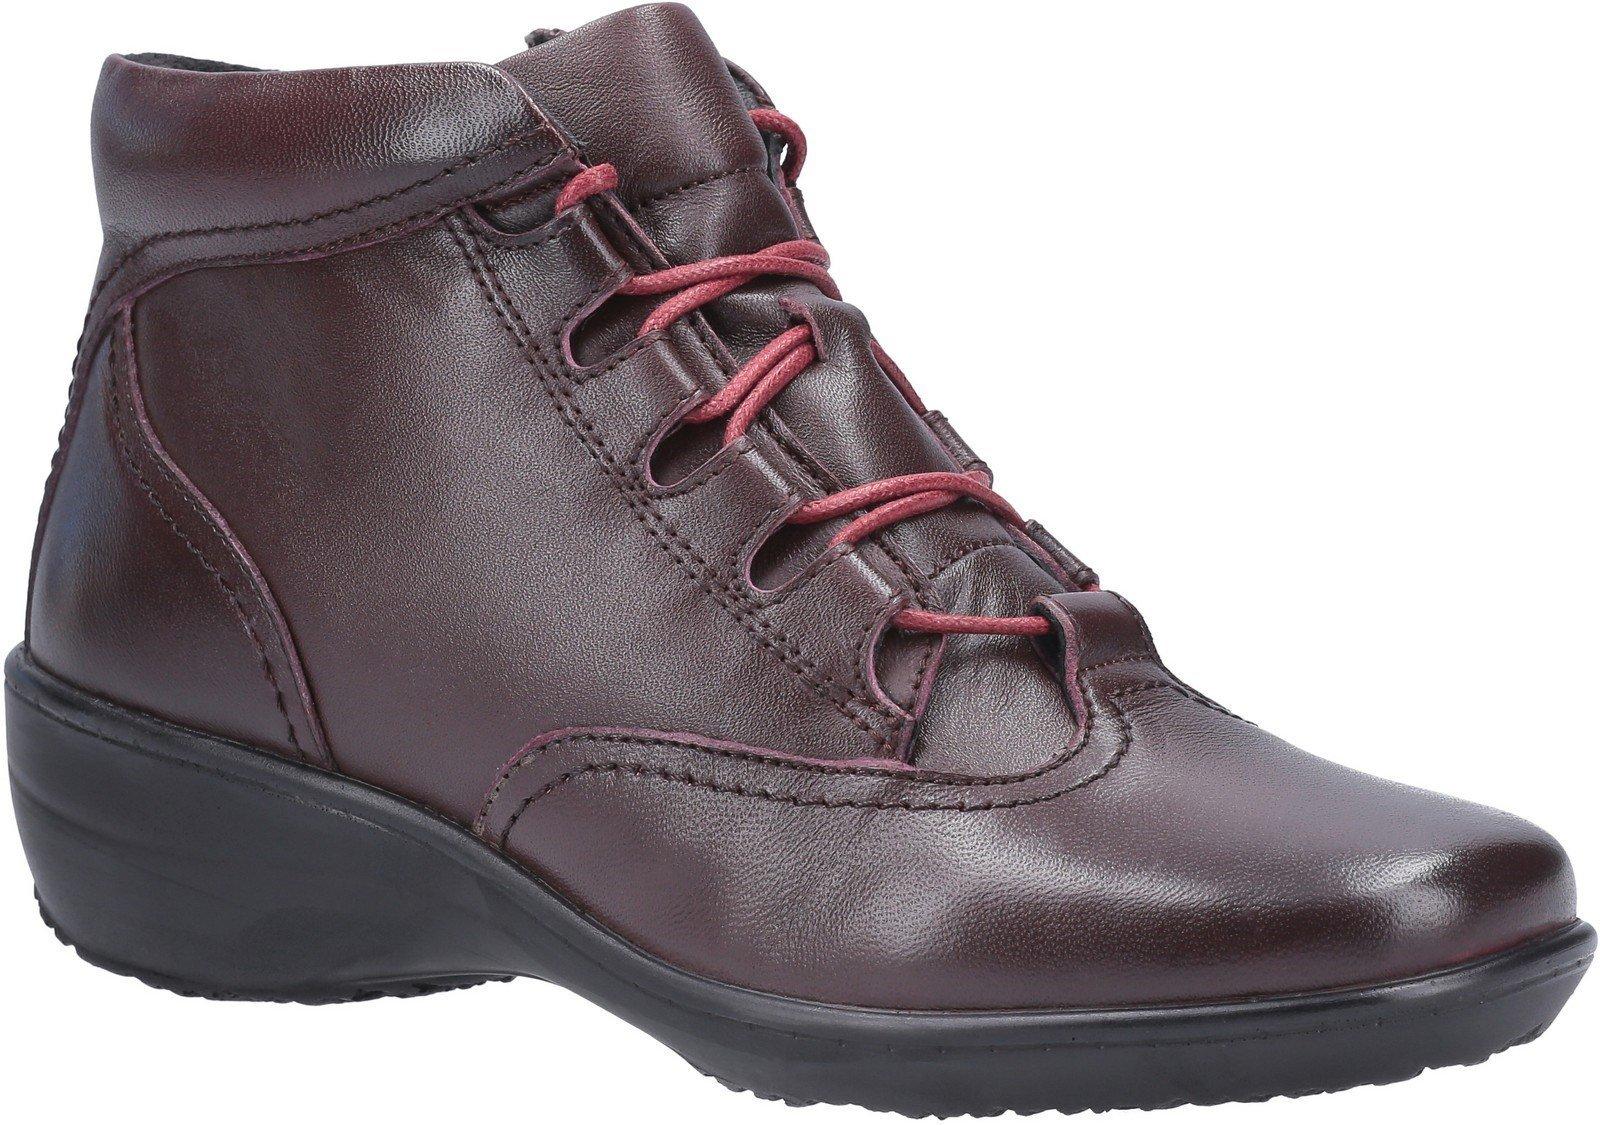 Fleet & Foster Women's Merle Lace Up Ankle Boot Black 29295-49581 - Burgundy 3